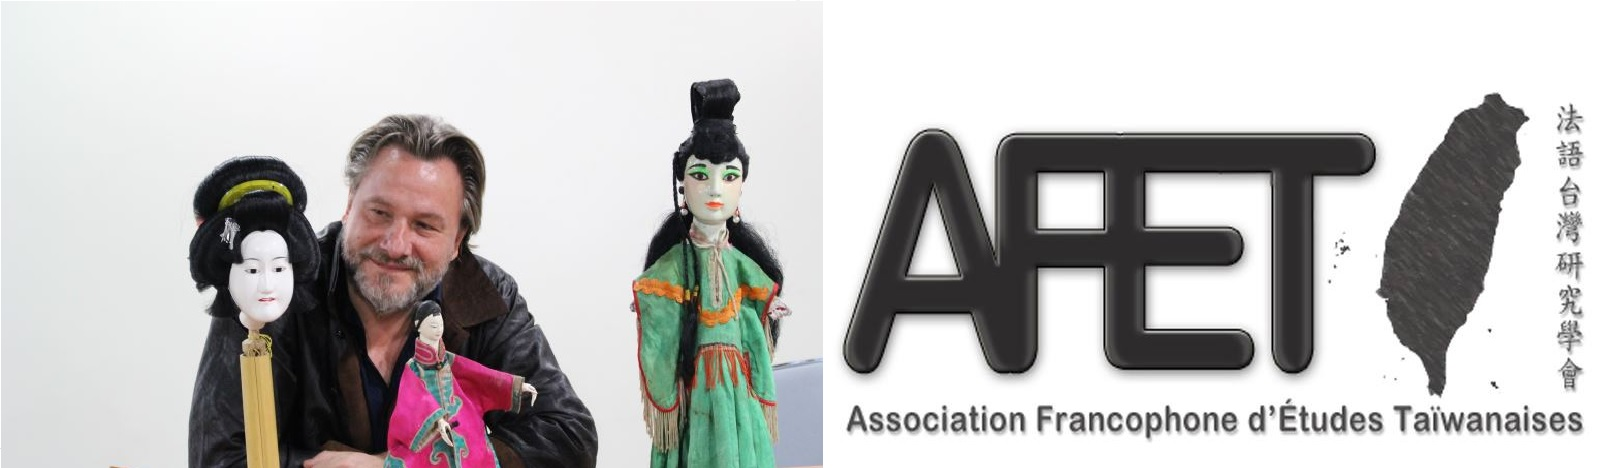 Taiwan-France Cultural Award names laureates, renews pact